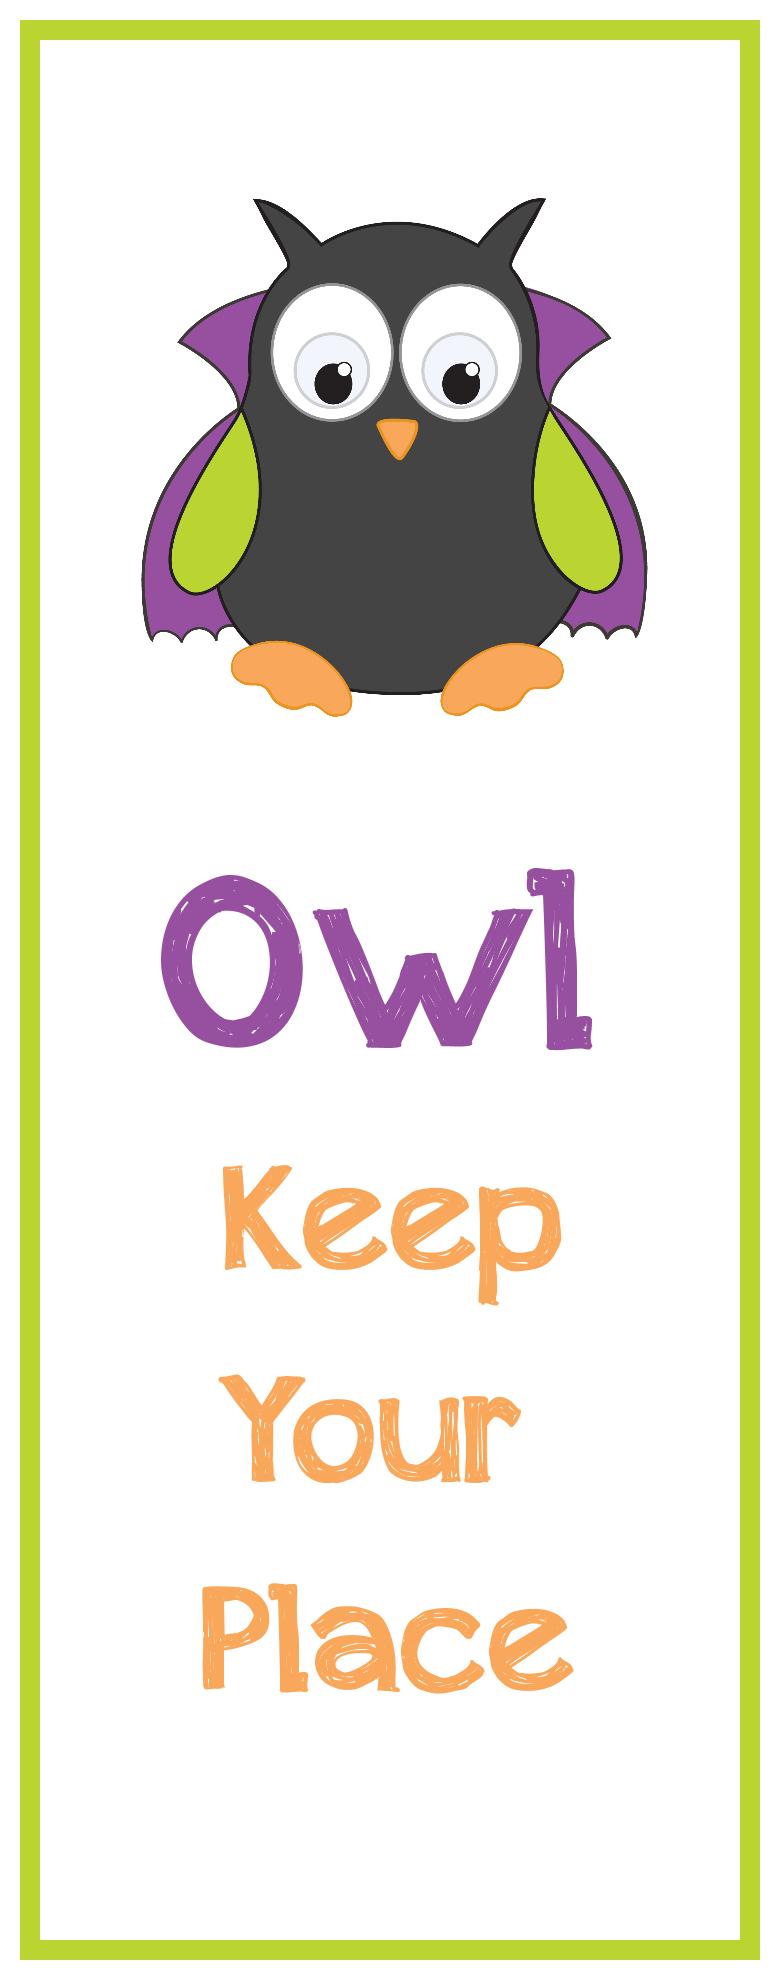 Free Printable Halloween Bookmarks - Free Printable Owl Bookmarks